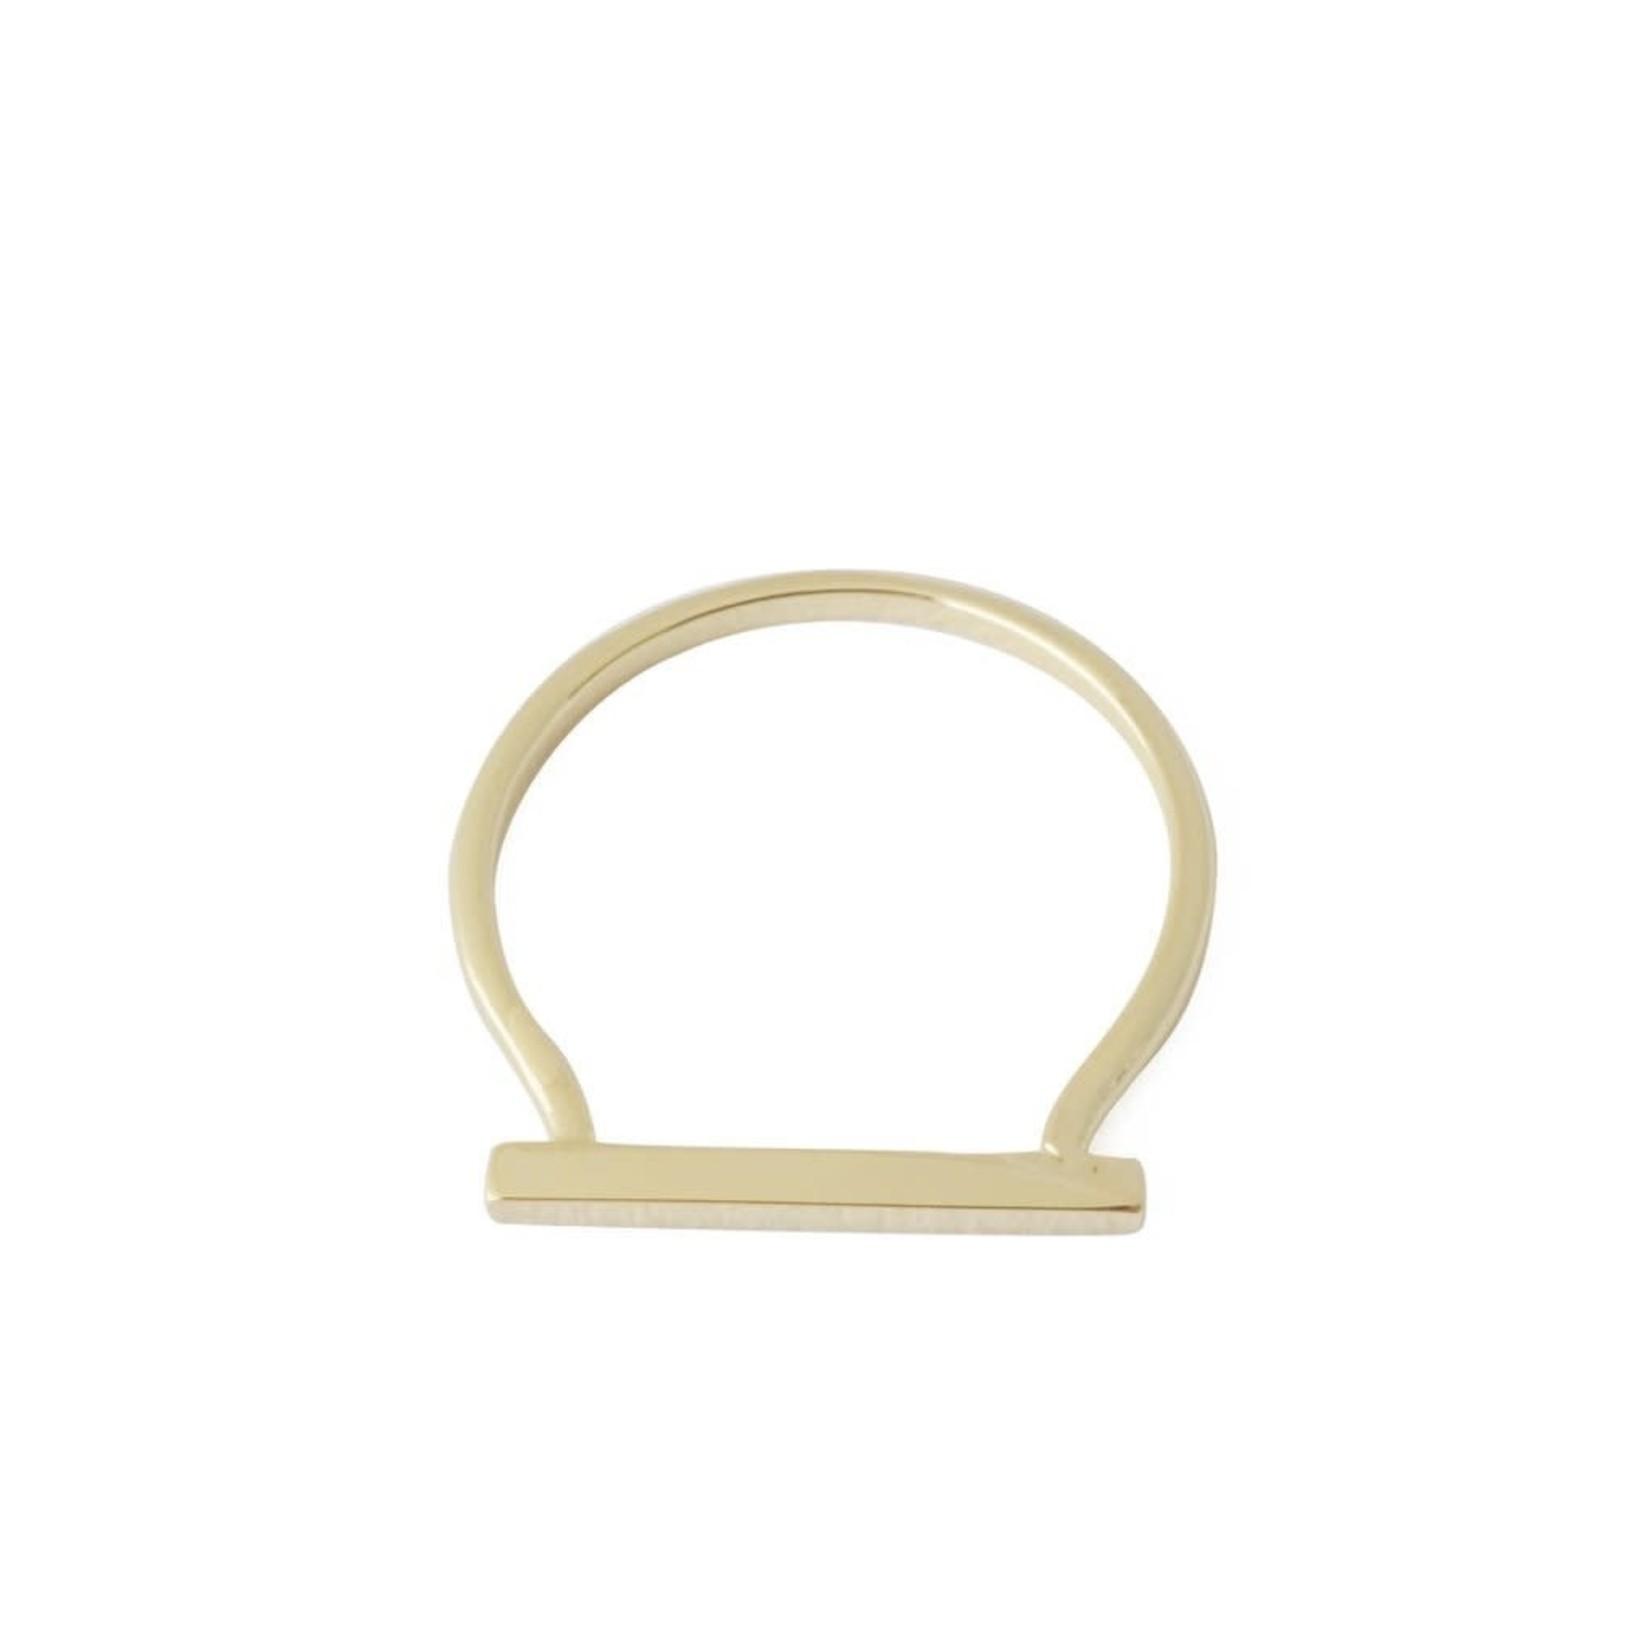 Honeycat Jewelry Honeycat Long Bar Ring Gold